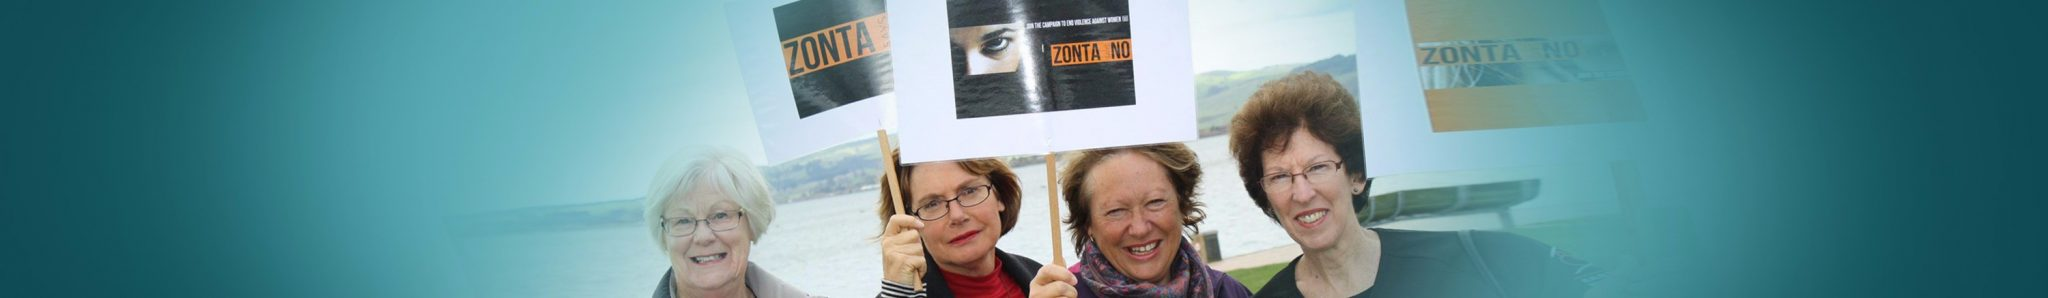 zonta-home-banner06